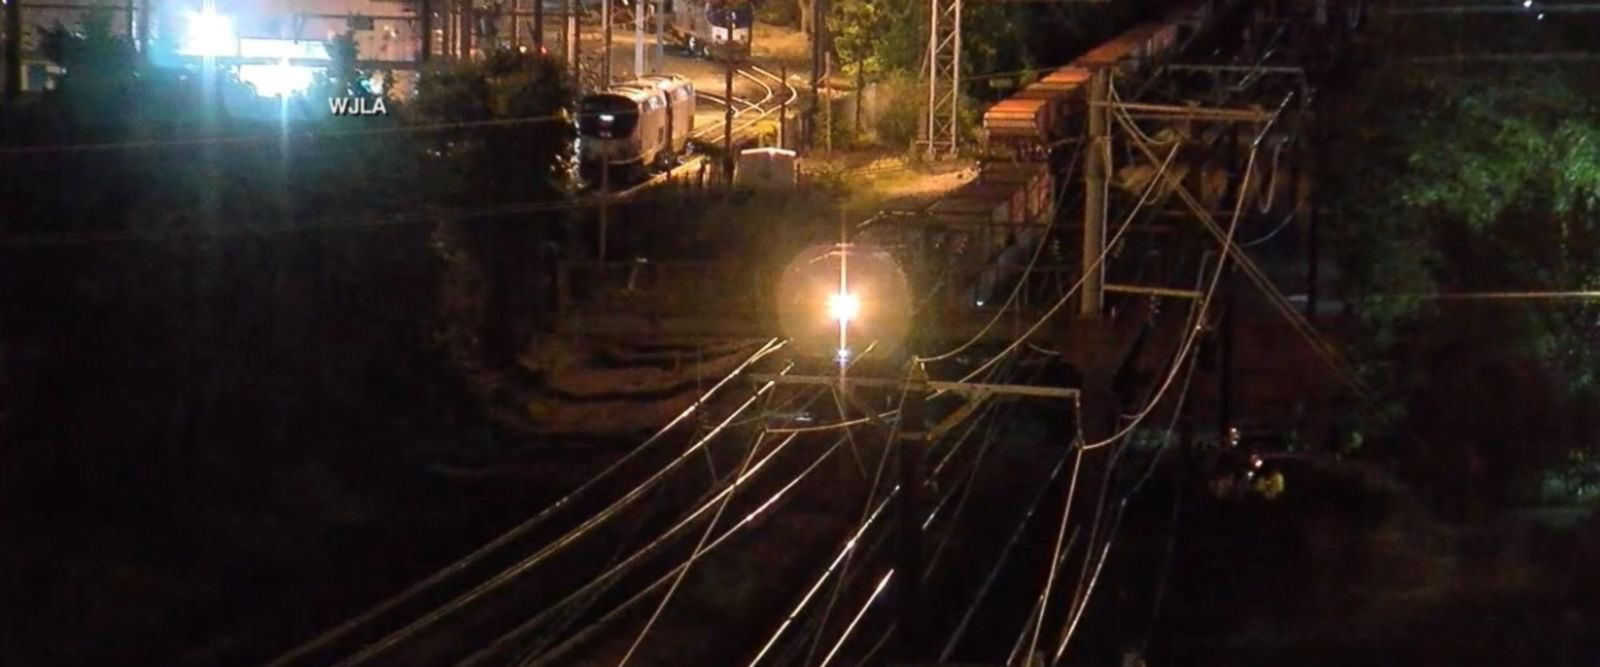 2 struck and killed by Amtrak train outside Washington DC (7.99 13) 43377224b